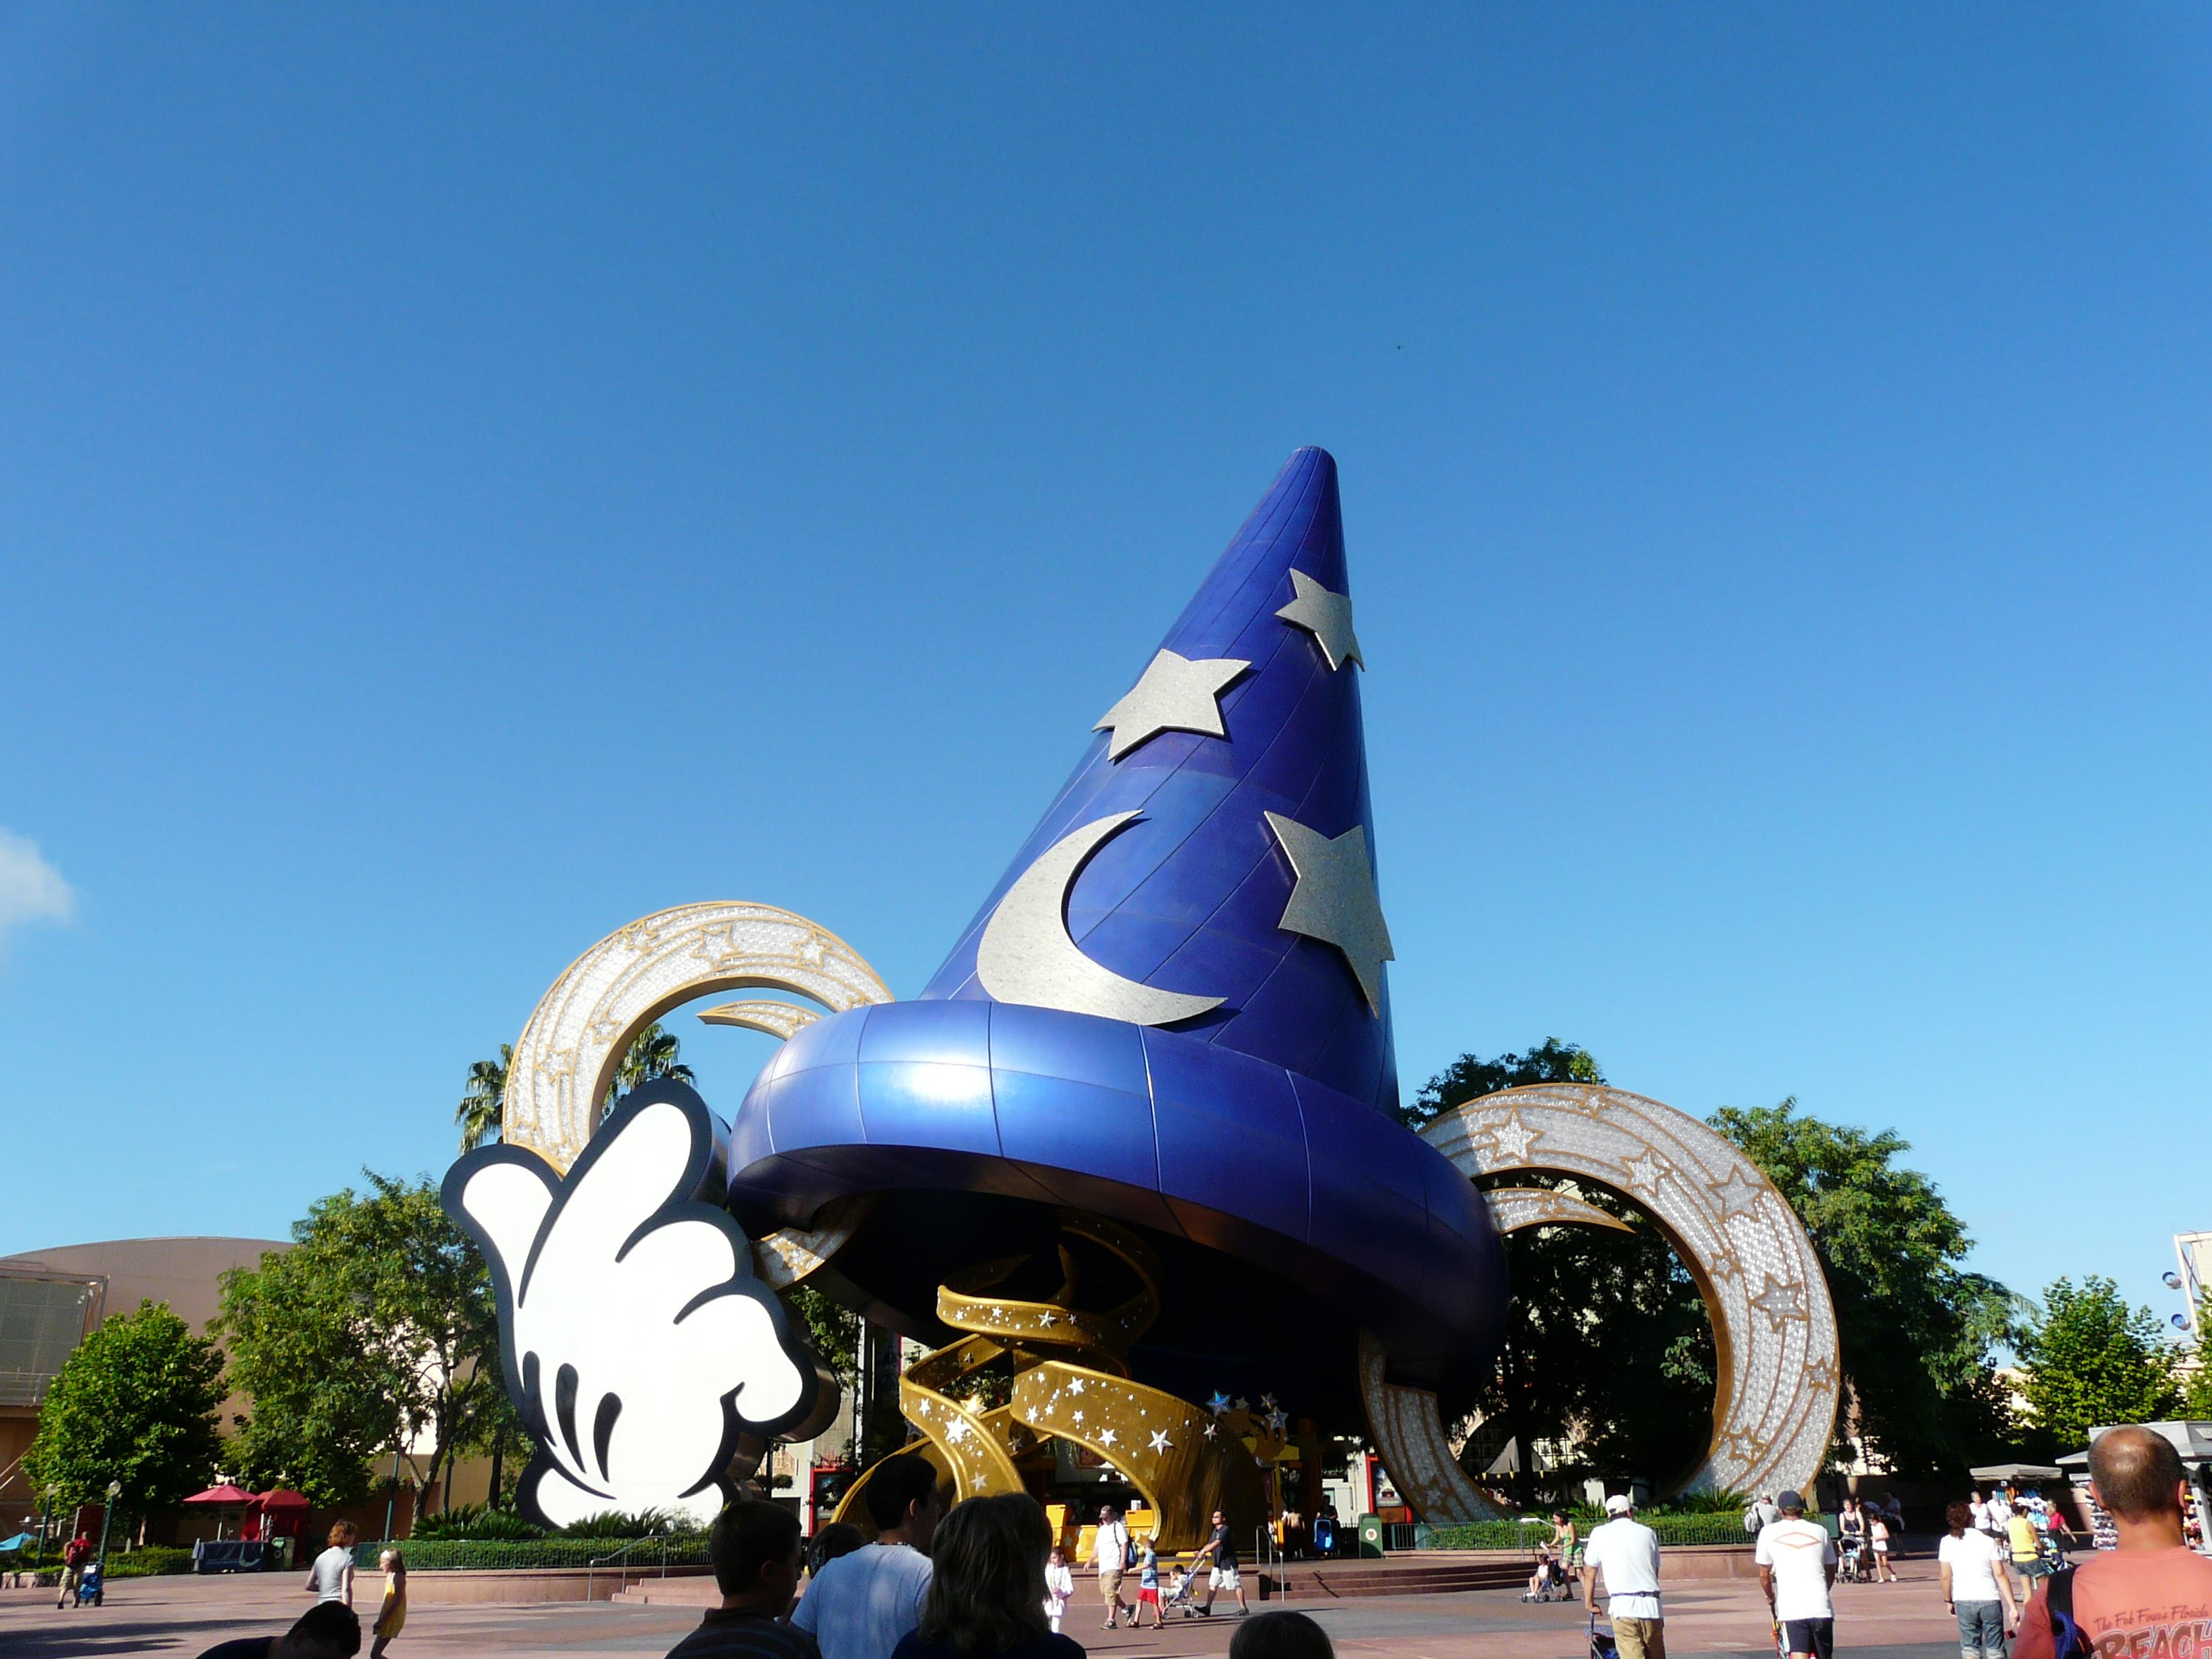 Zauberhut in Disney's Hollywood Studios